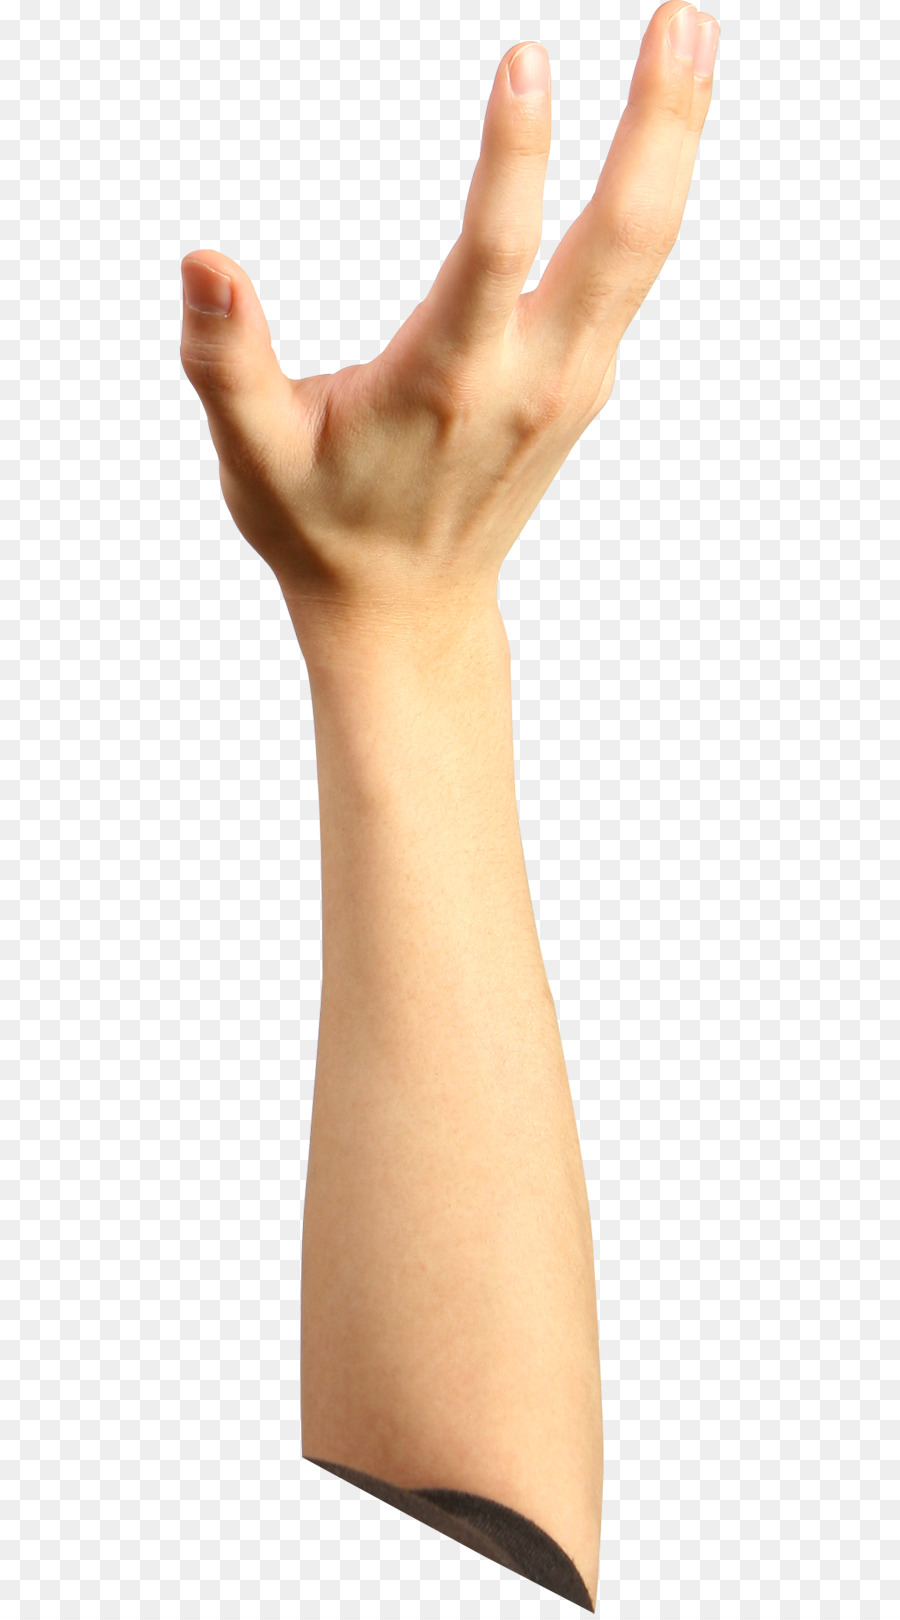 большого пальца фото жест